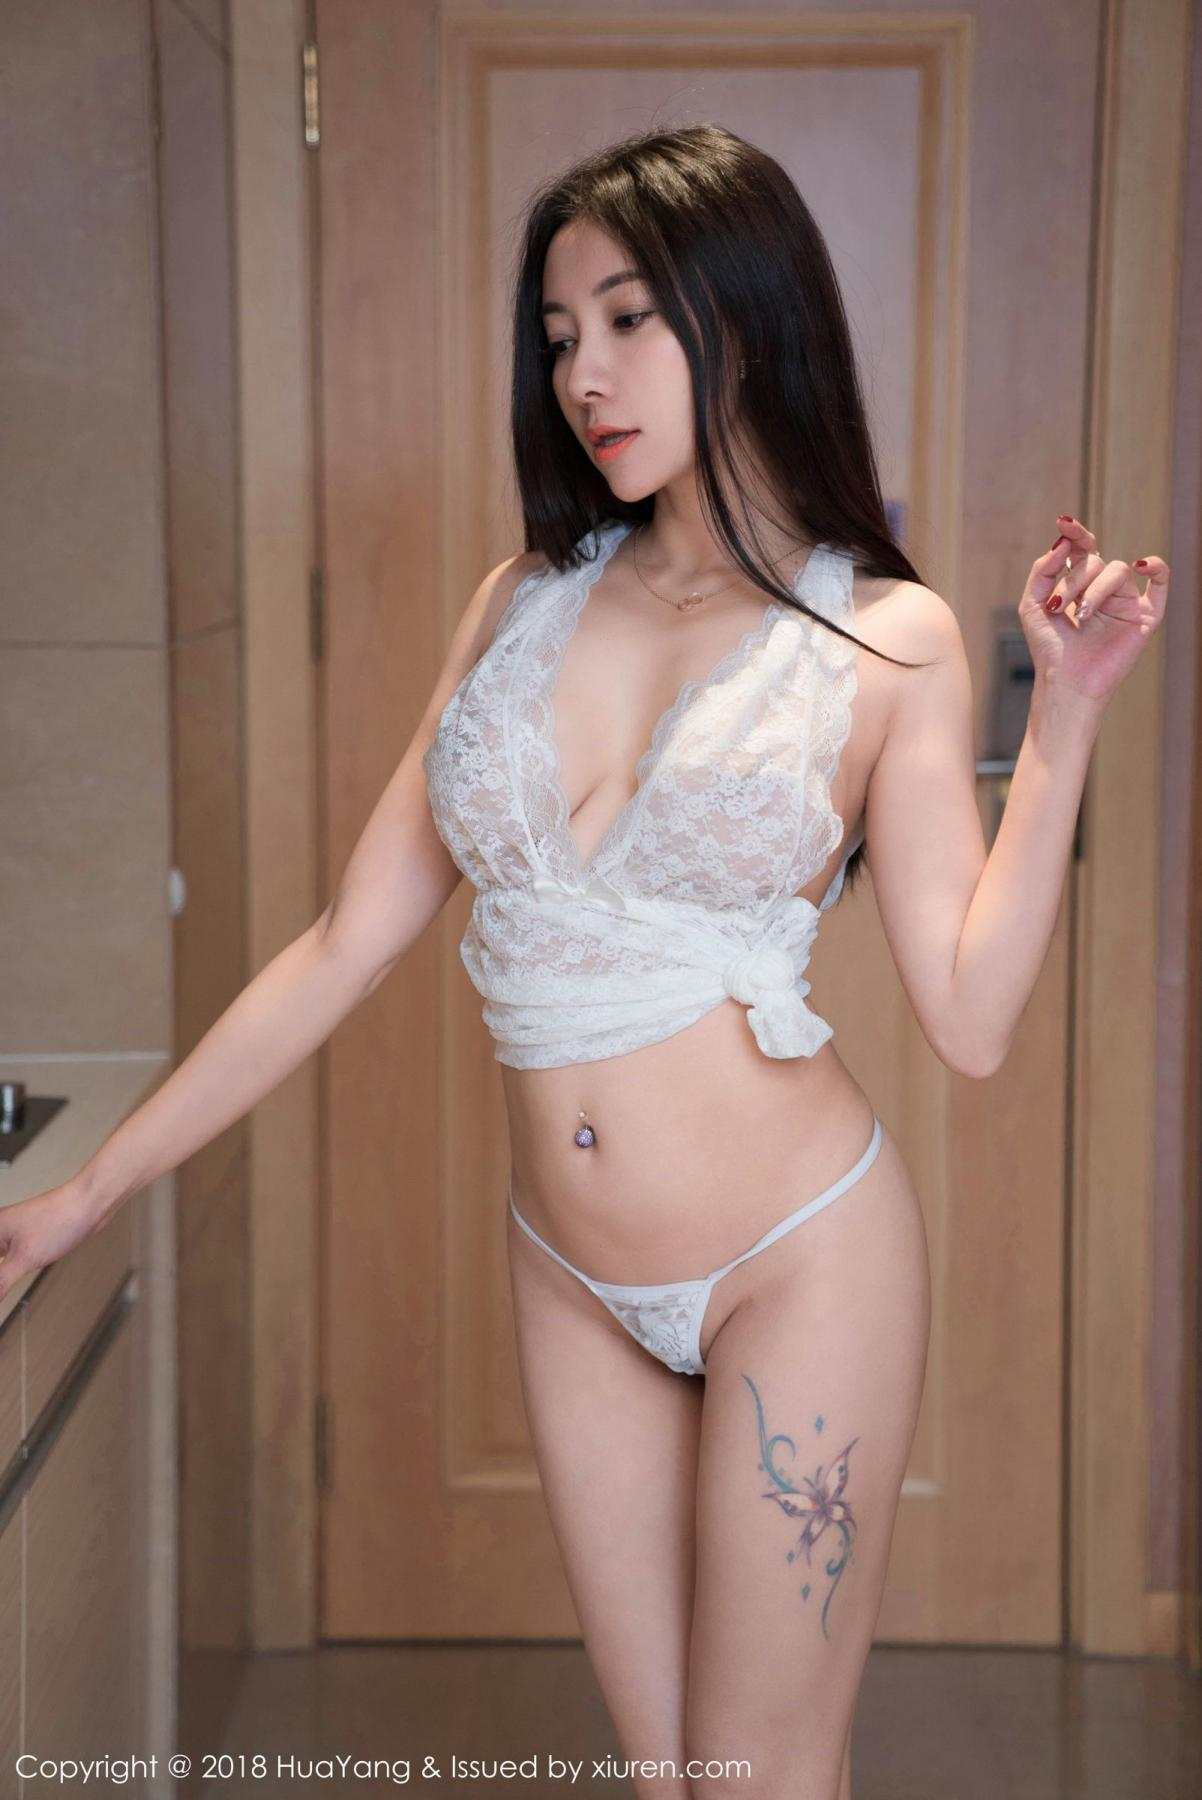 [Huayang] Vol.090 Song Guo Er 29P, HuaYang, Song Guo Er, Underwear